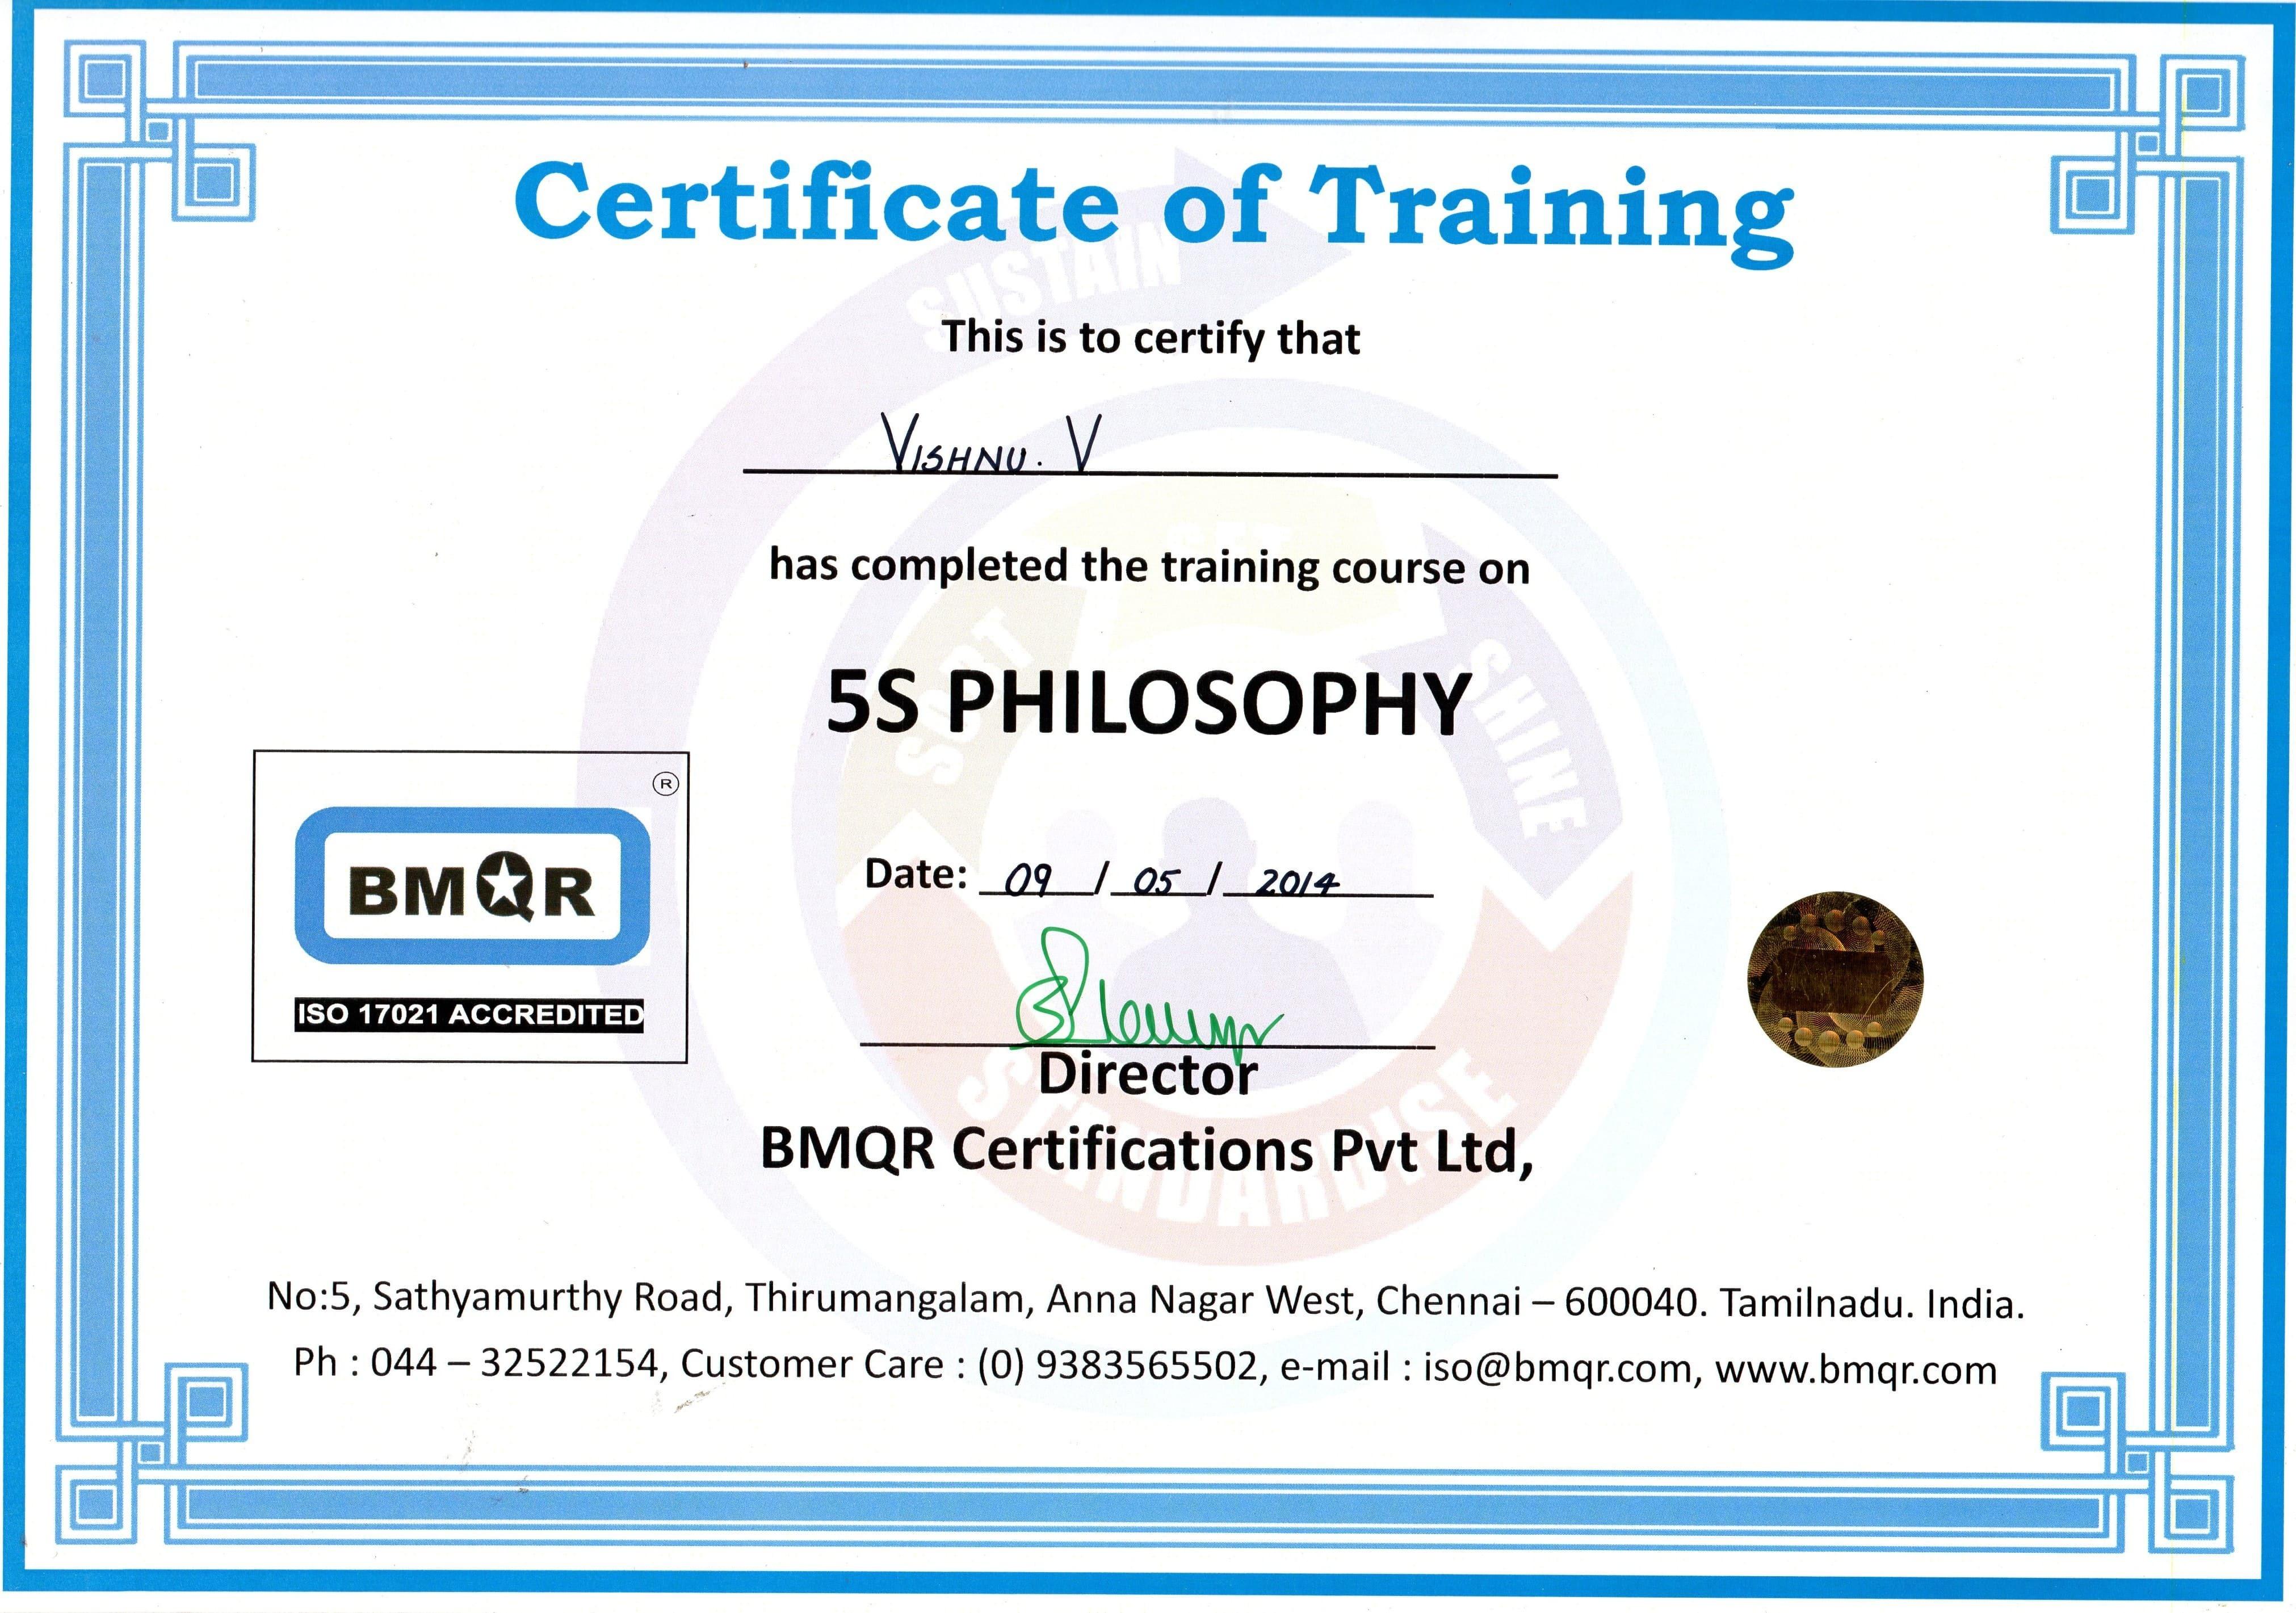 Six sigma green belt certification course in chennai software vishnu vijayan bayt com 1betcityfo Image collections